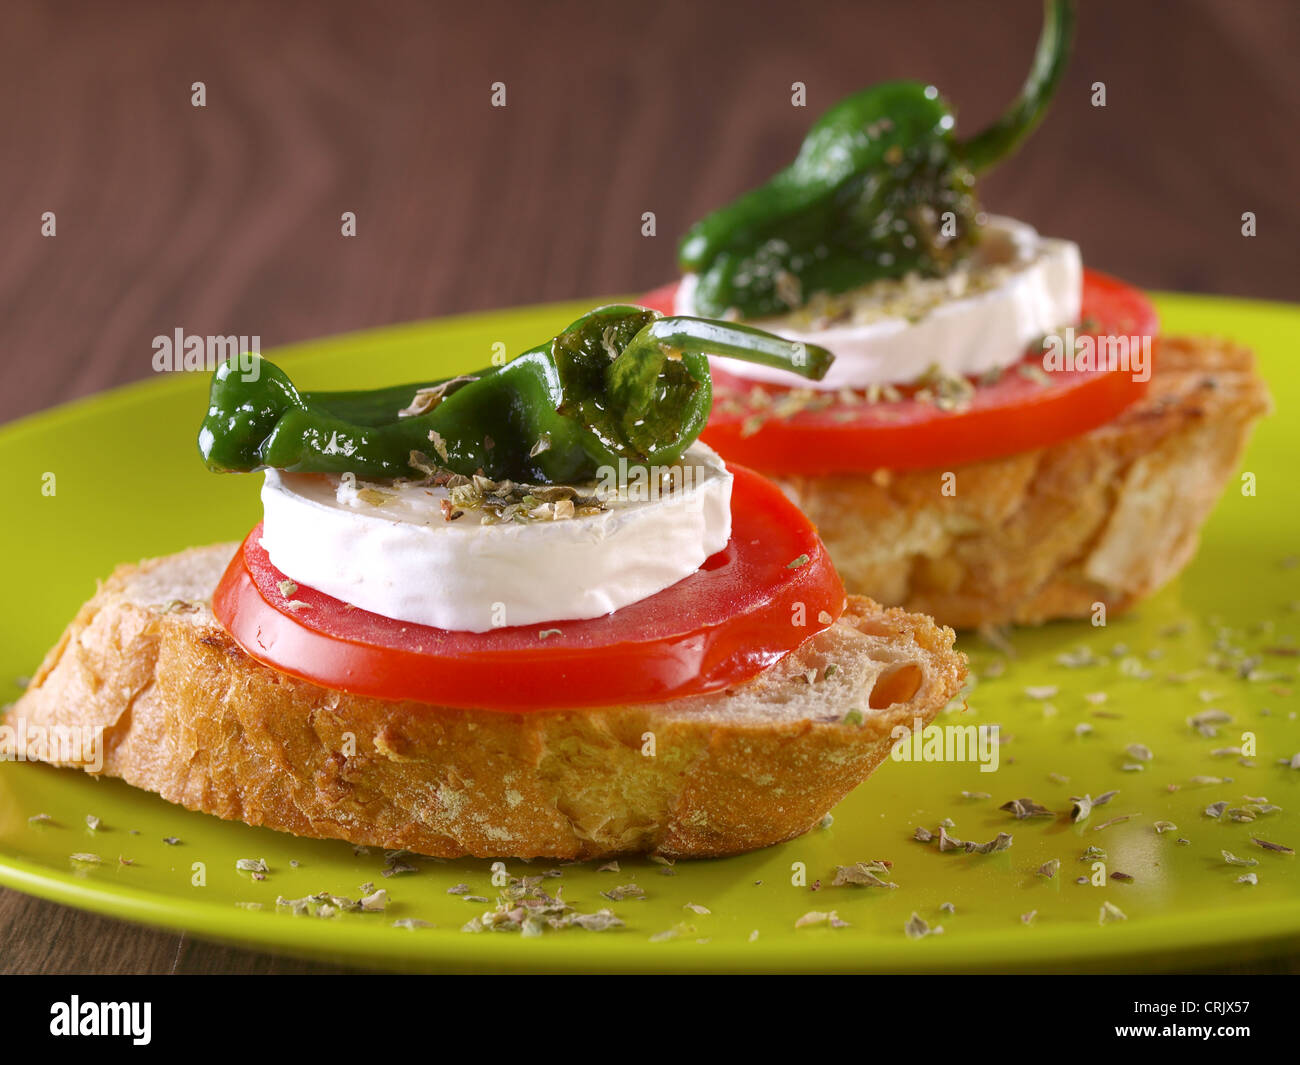 Vegetali Montadito. Pasto vegetariano. Immagini Stock